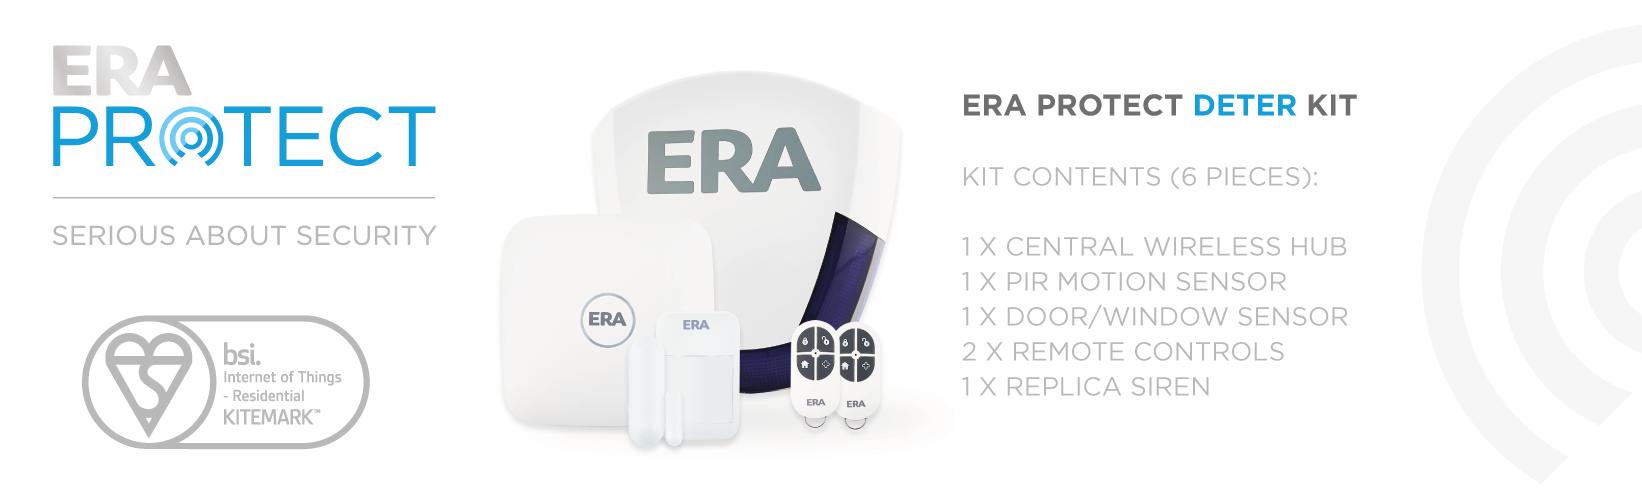 ERA Protect Battery Operated Wireless Siren